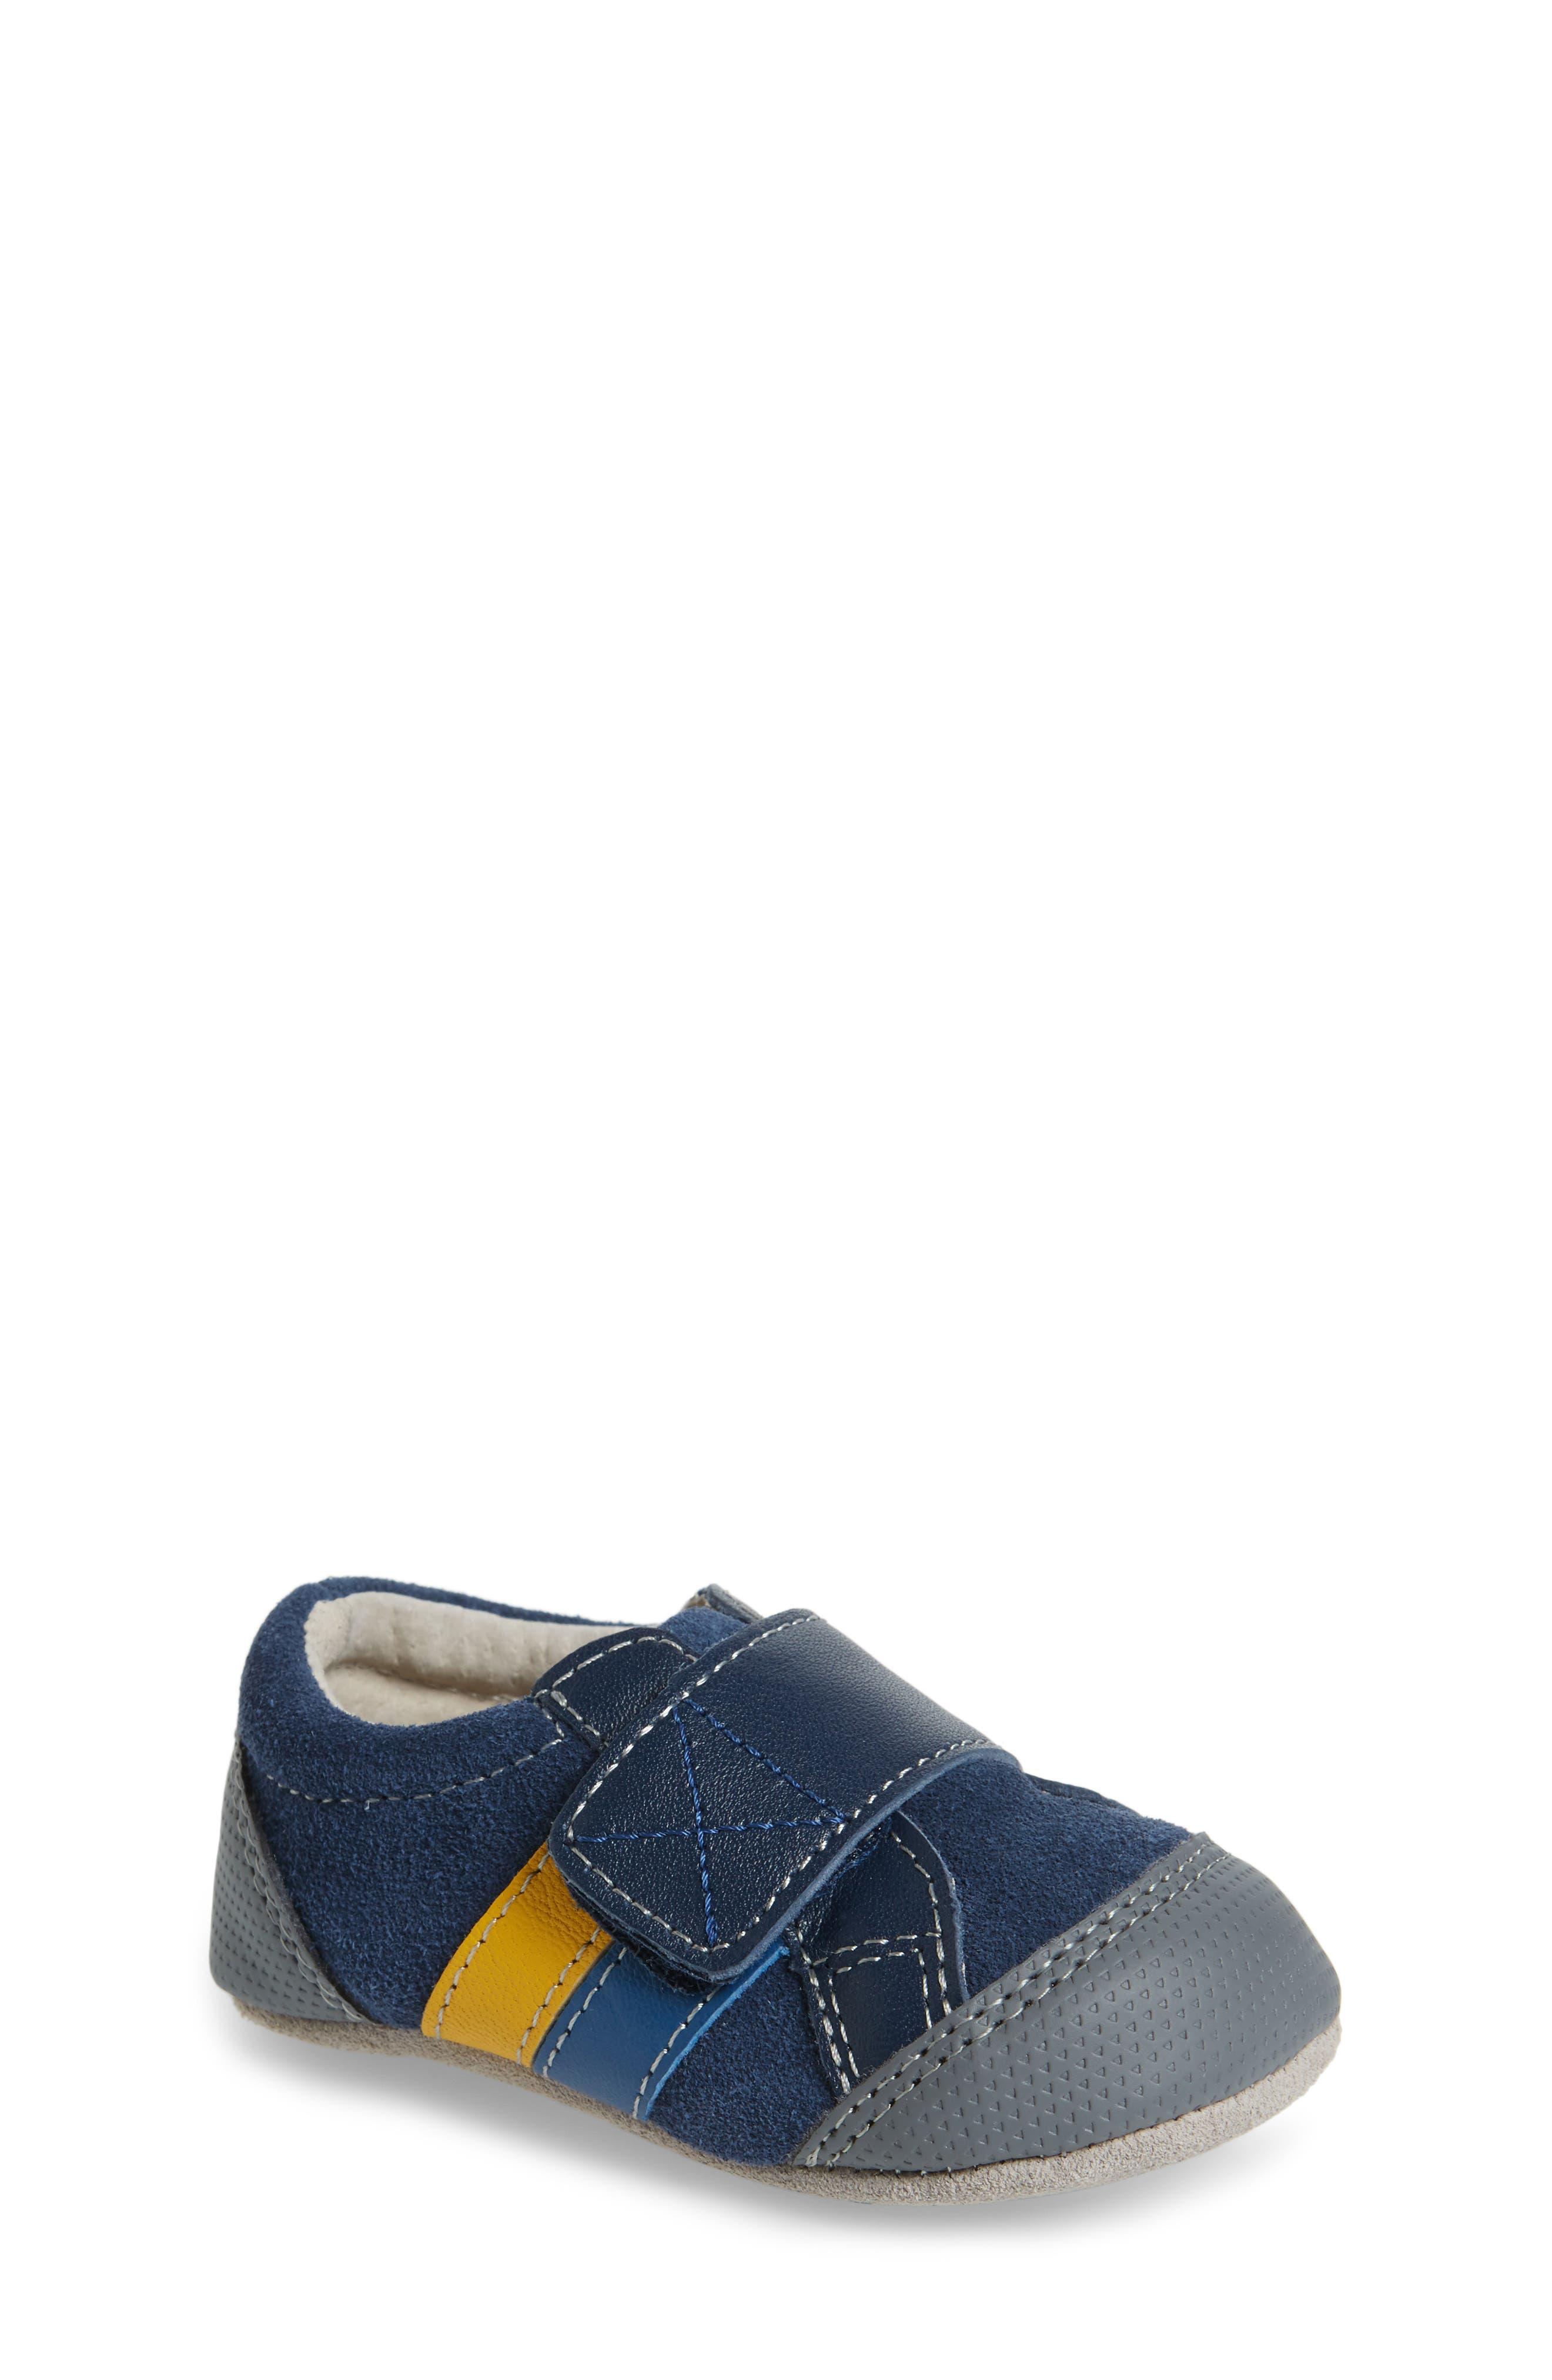 See Kai Run Randall II Crib Shoe (Baby)